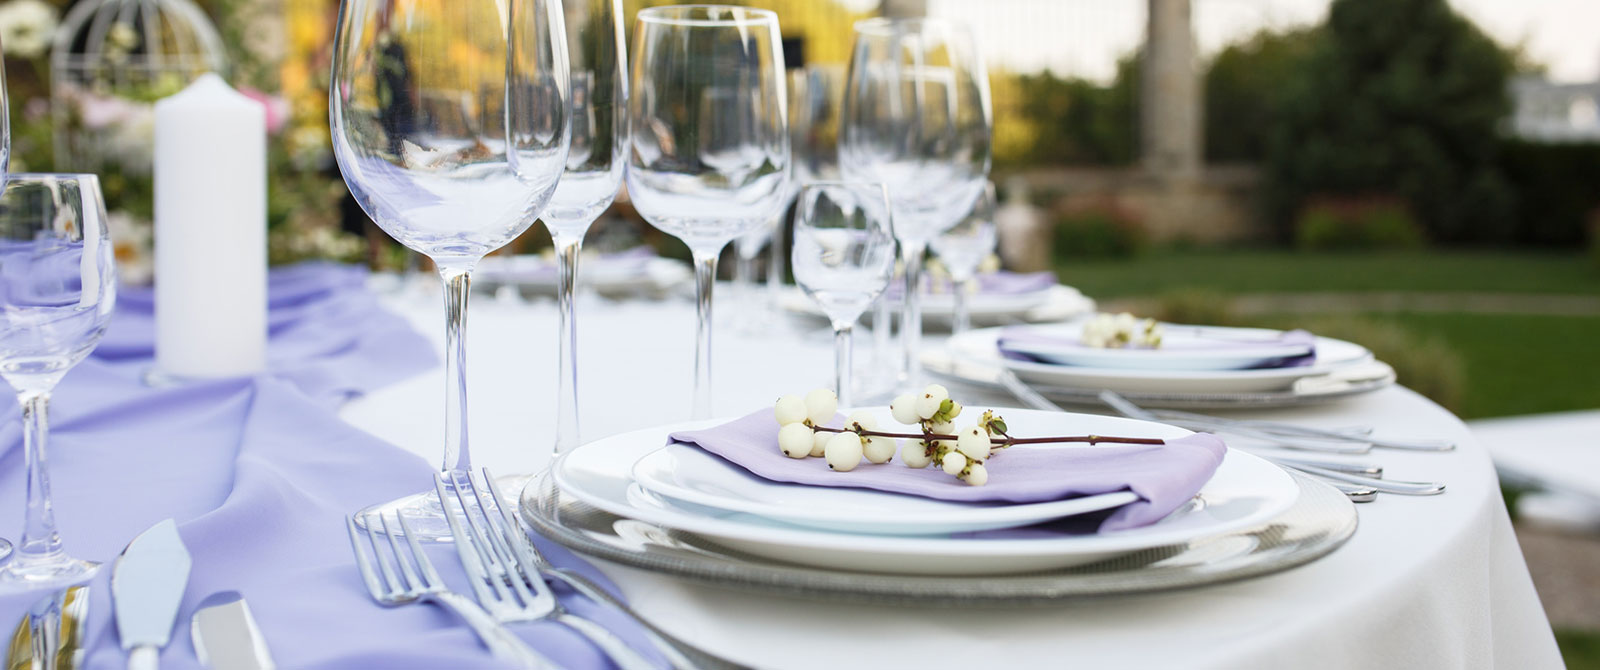 location materiel mariage carcassonne